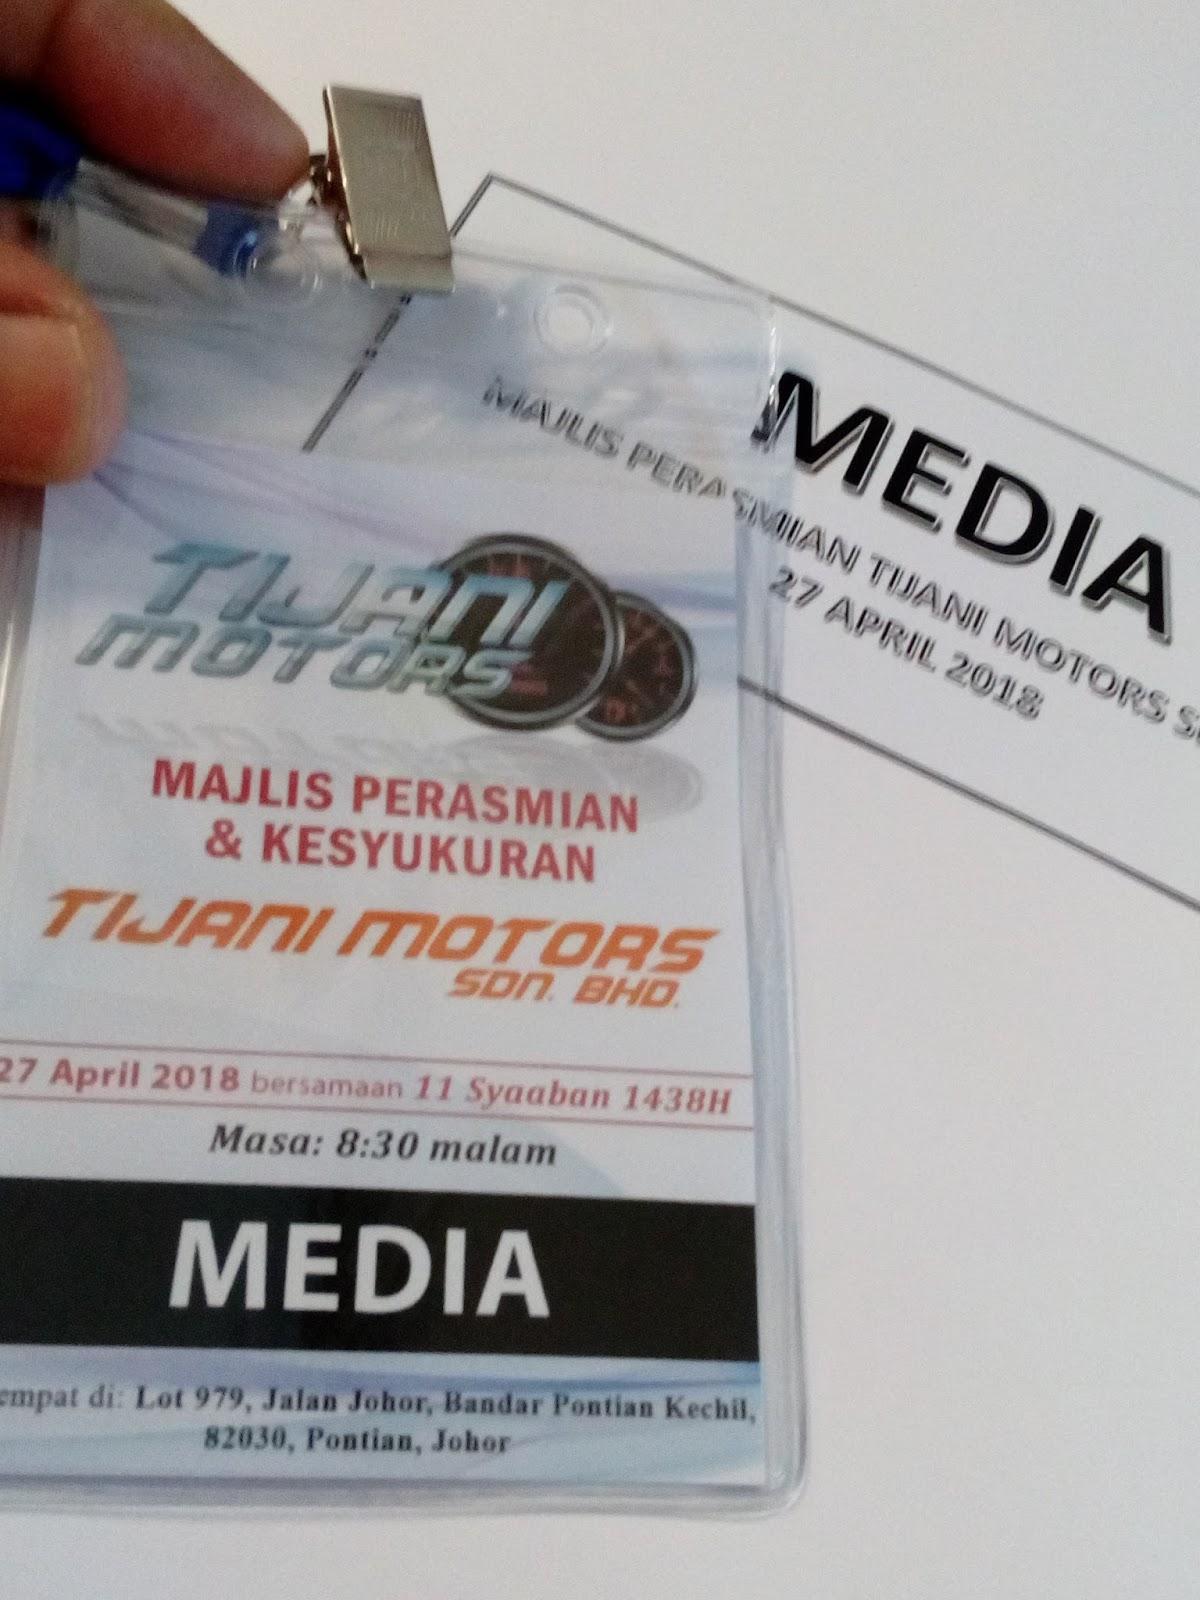 wakil media blogger